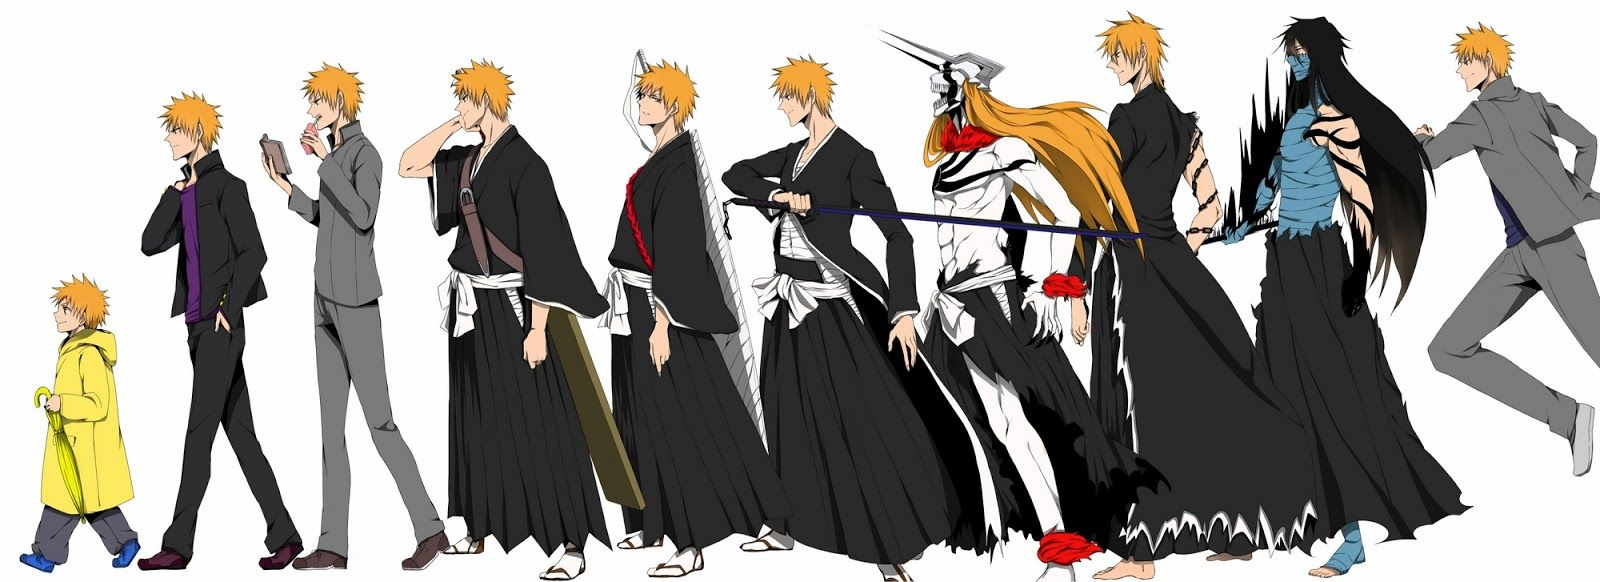 Here is the summary of Bleach chapter 523: Ichigo and Renji